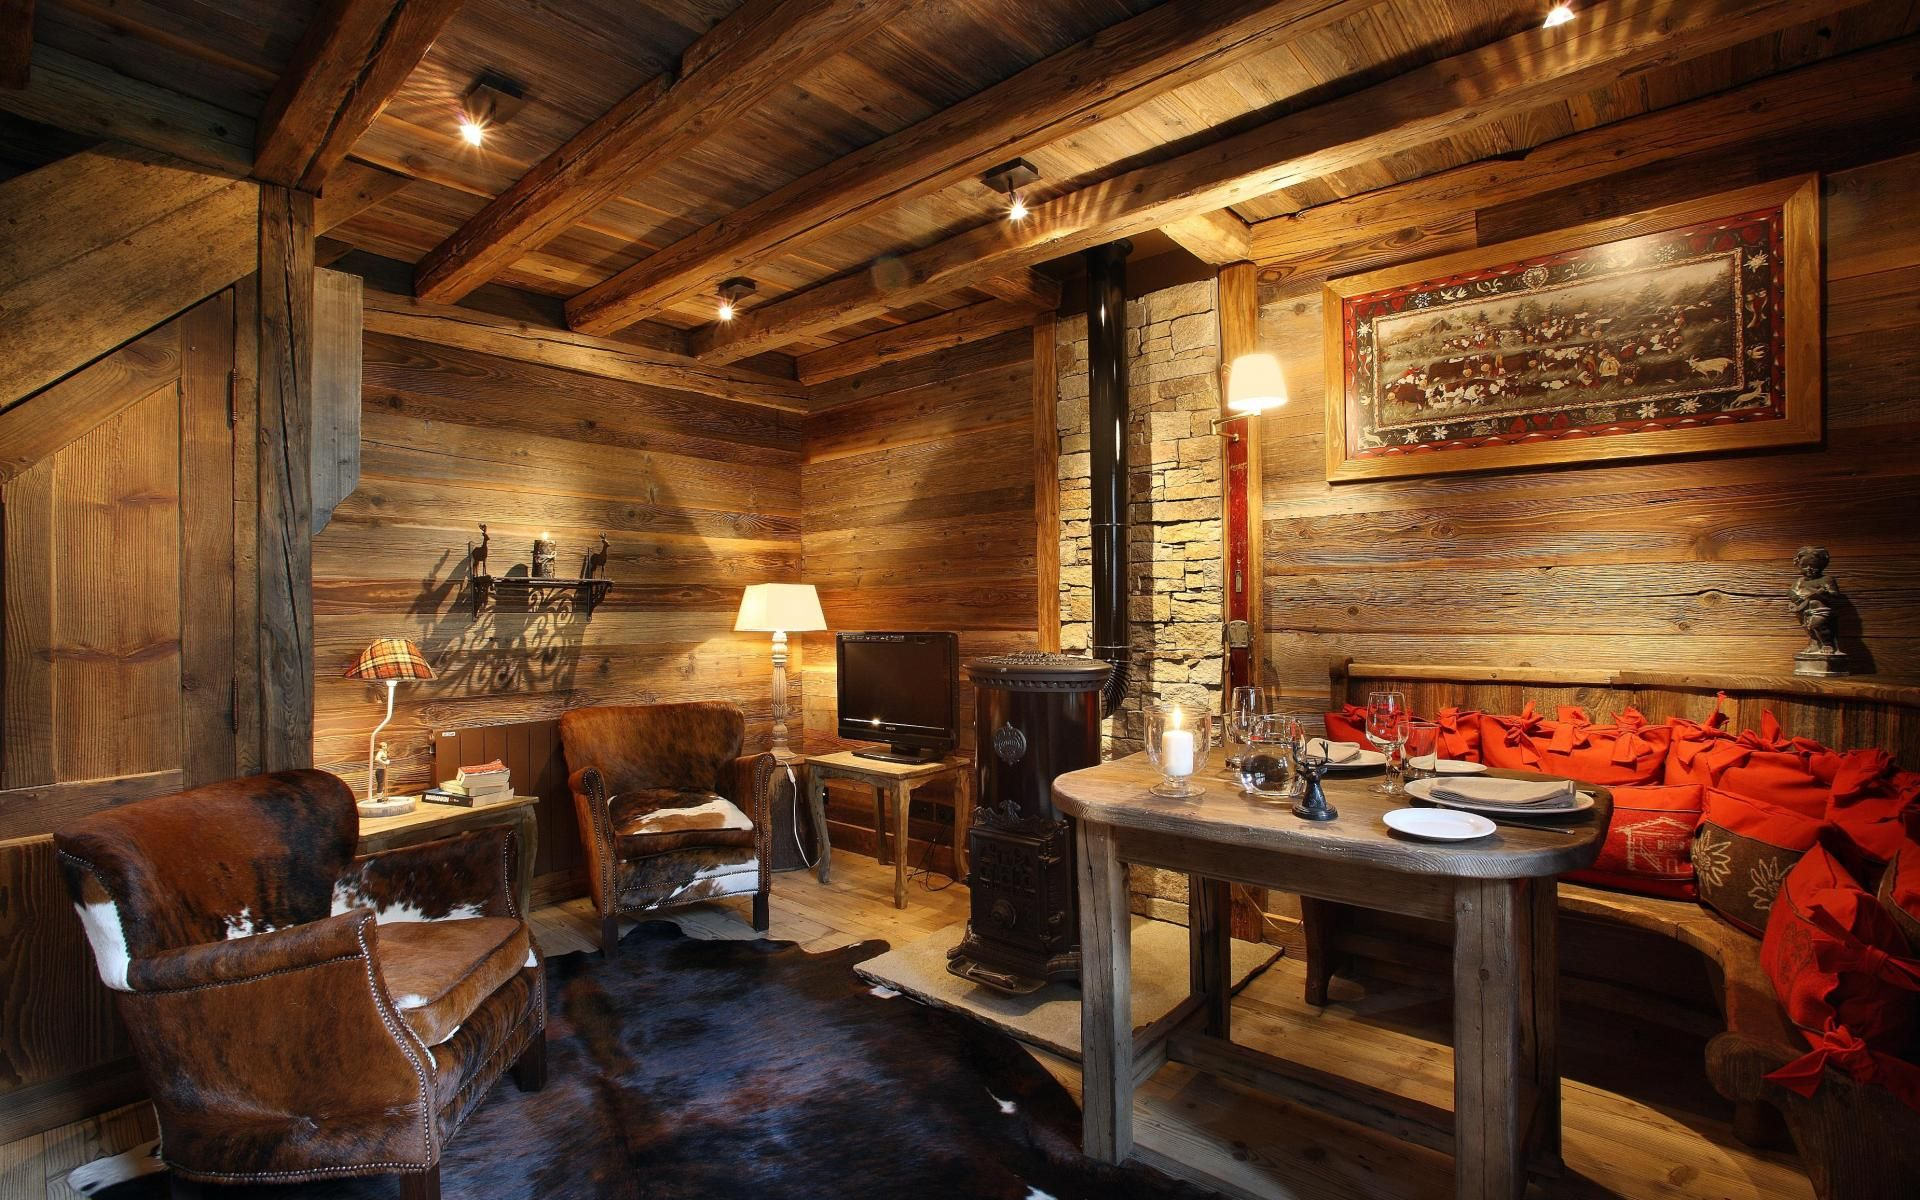 Luxury Ski Chalet, Petite Marmotte Lodge, Courchevel 1650, France, France